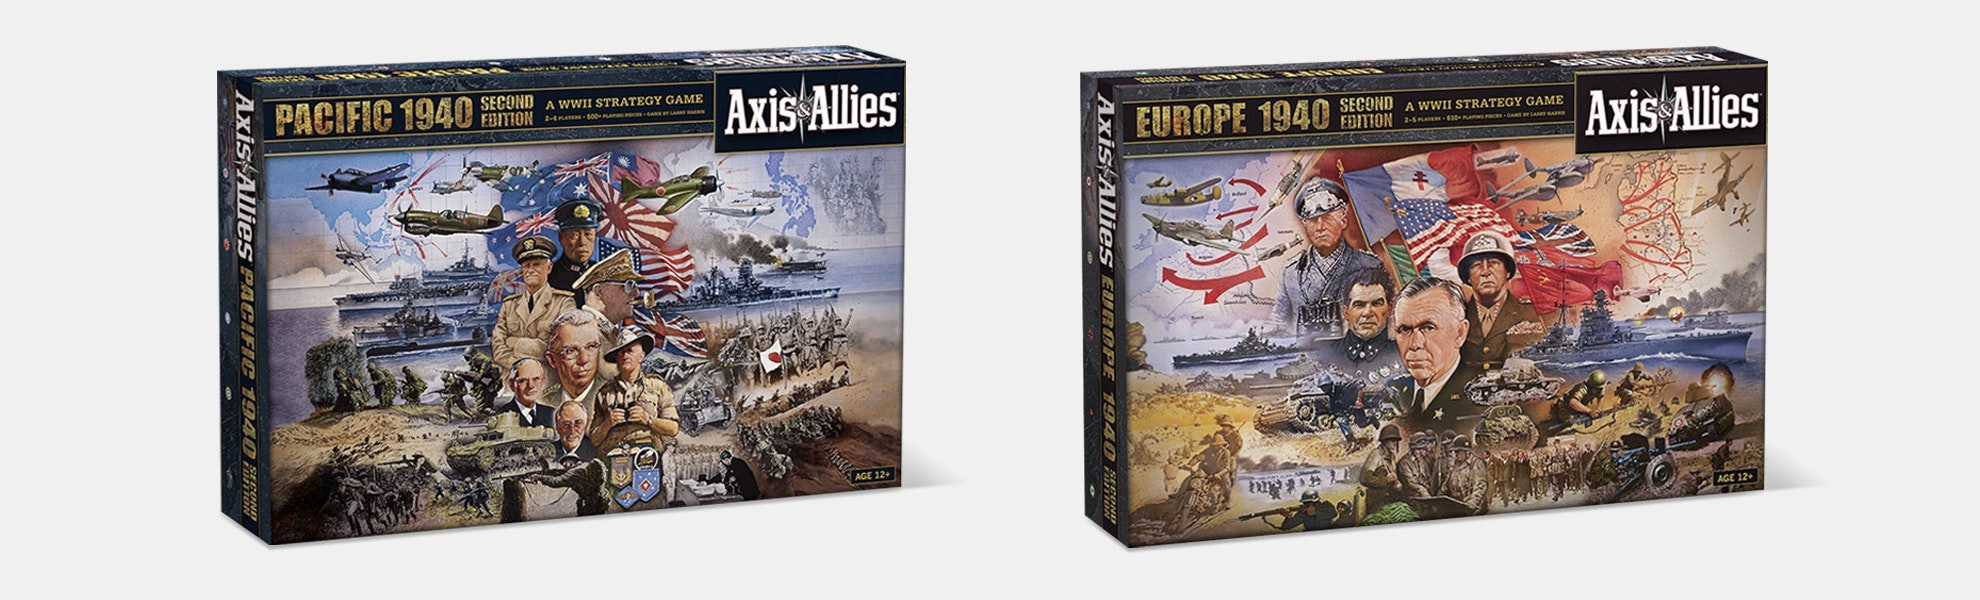 Axis & Allies 1940 Bundle